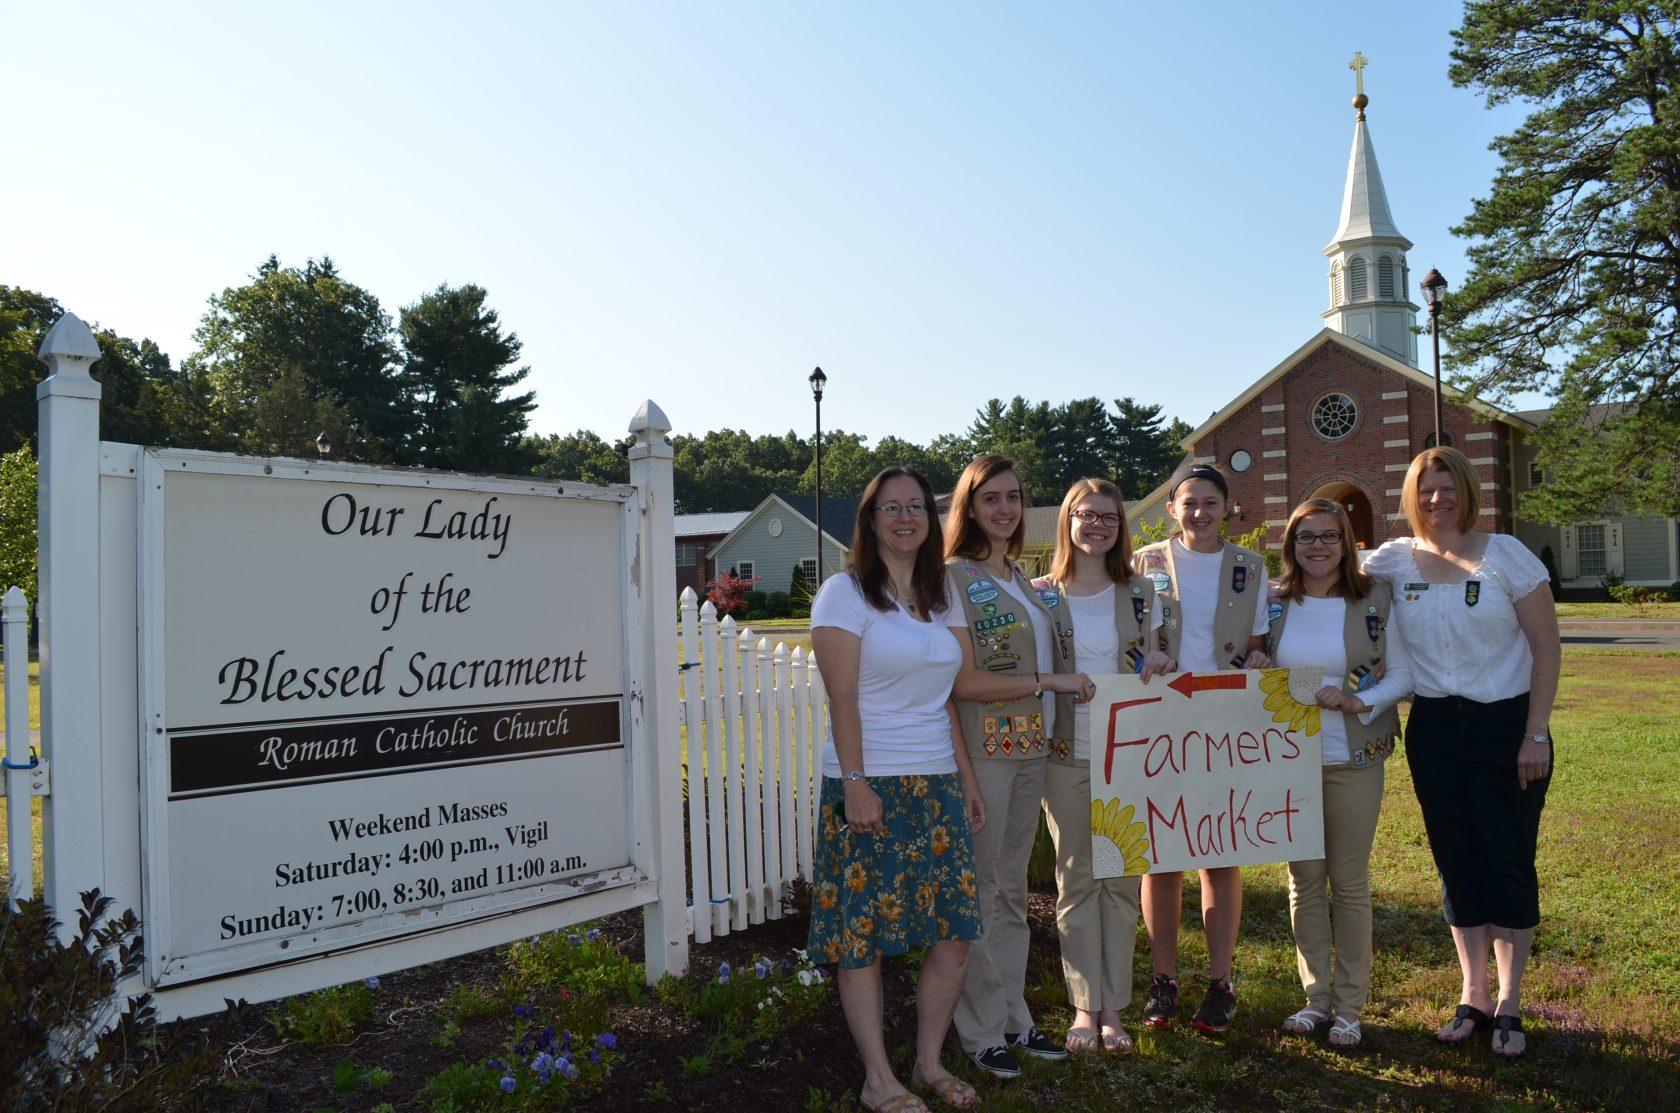 Girl Scouts seeking vendors for farmers' market